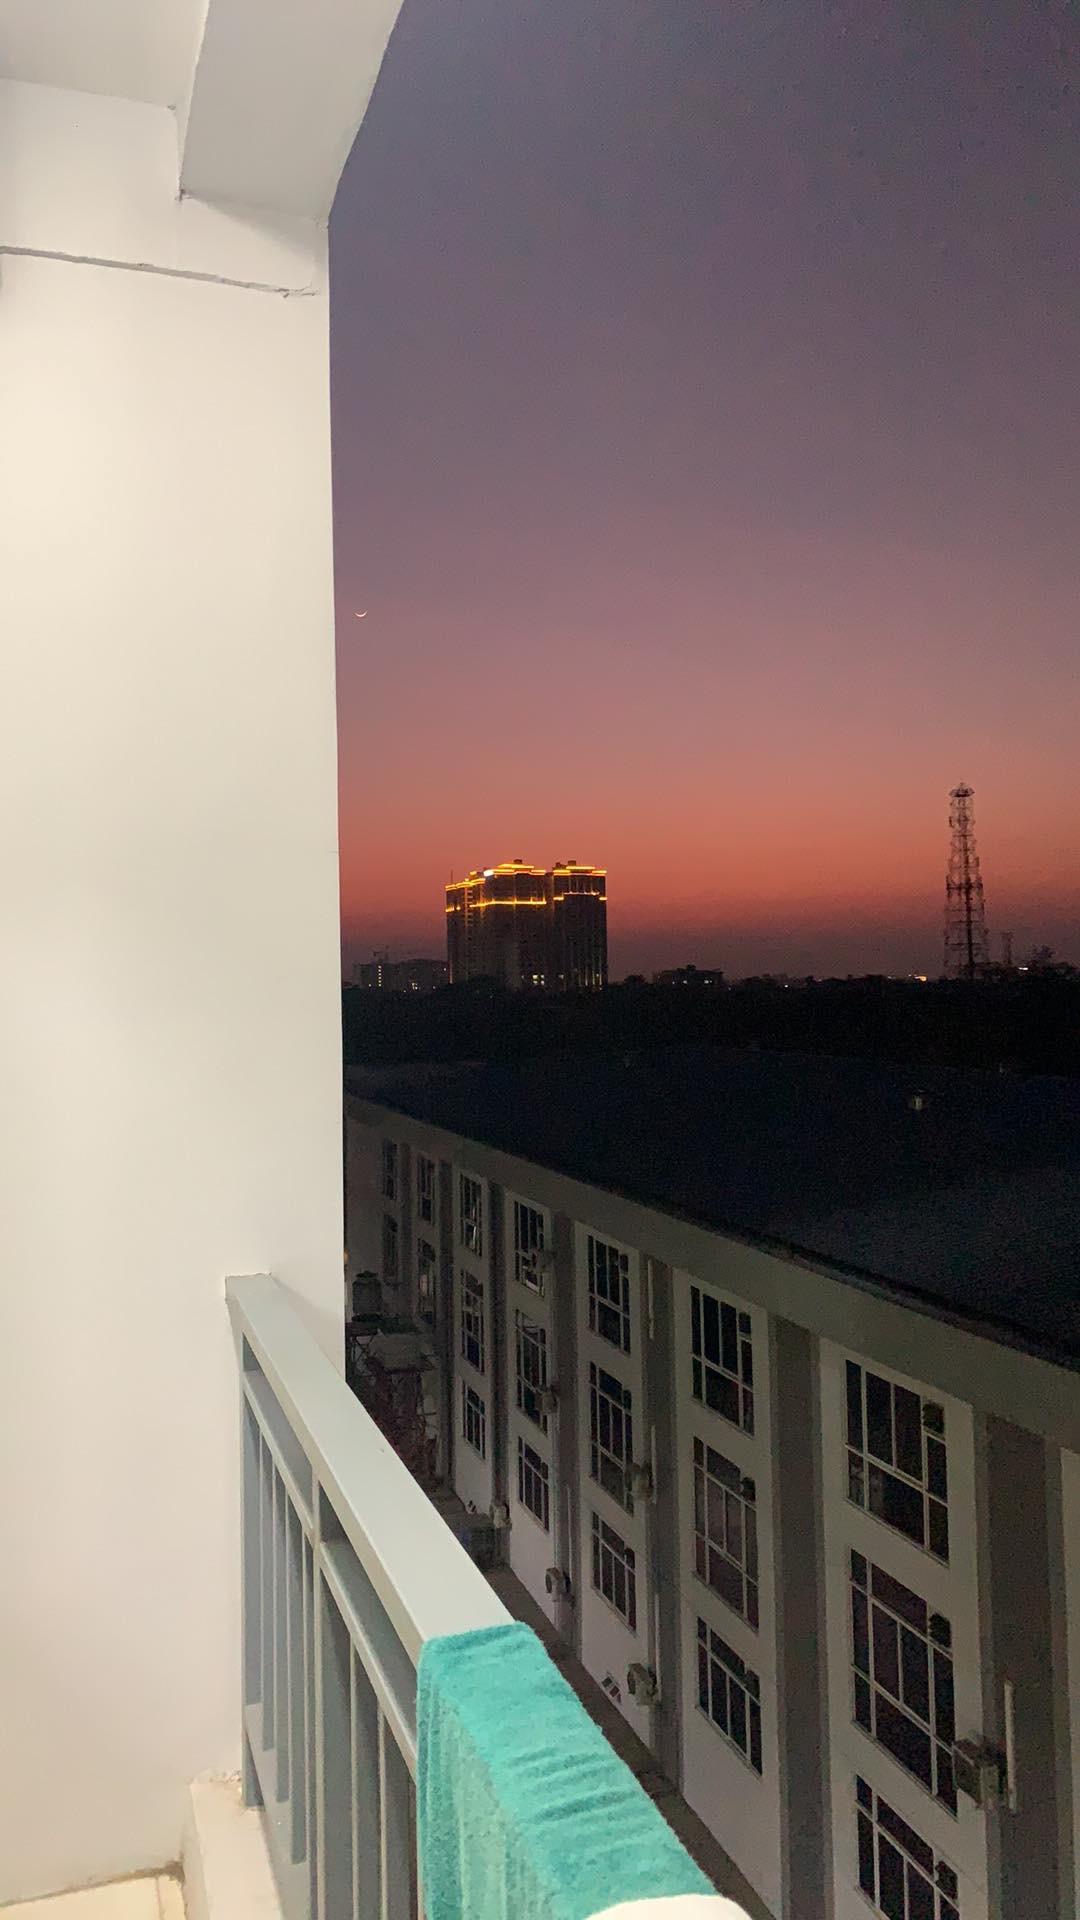 The balcony of mandatory quarantine facility